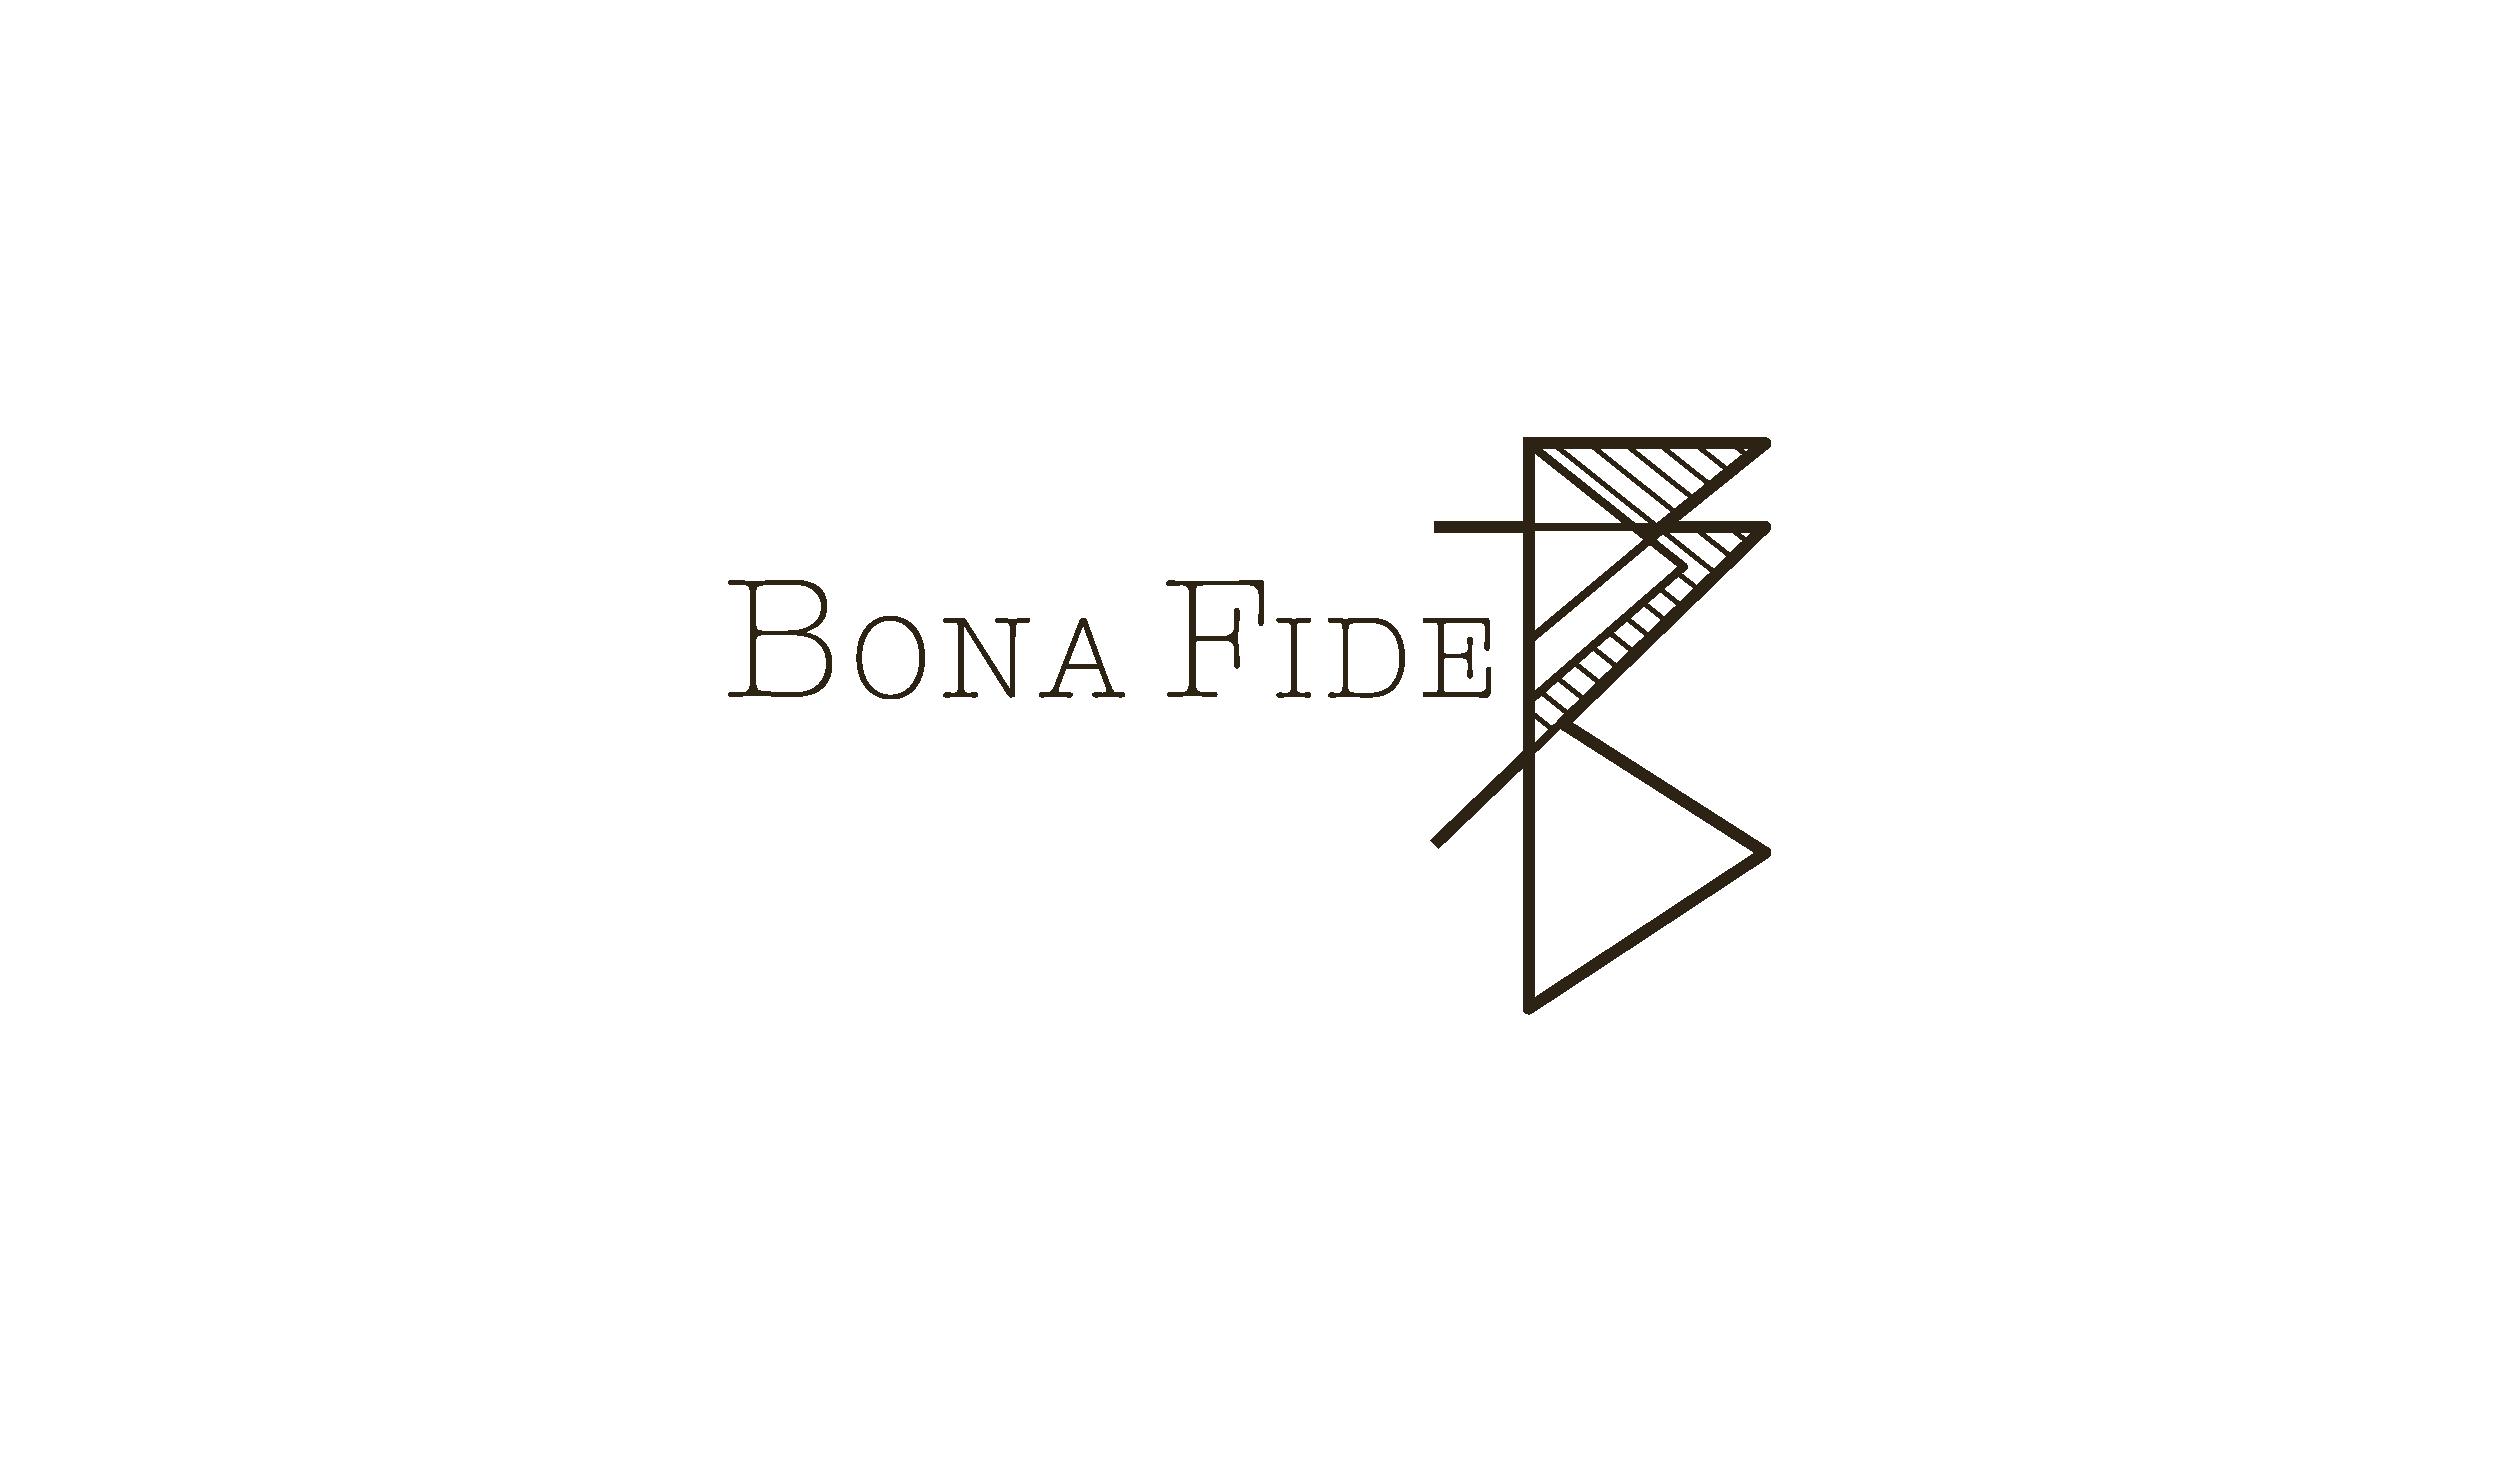 logo bonafide clothing shop